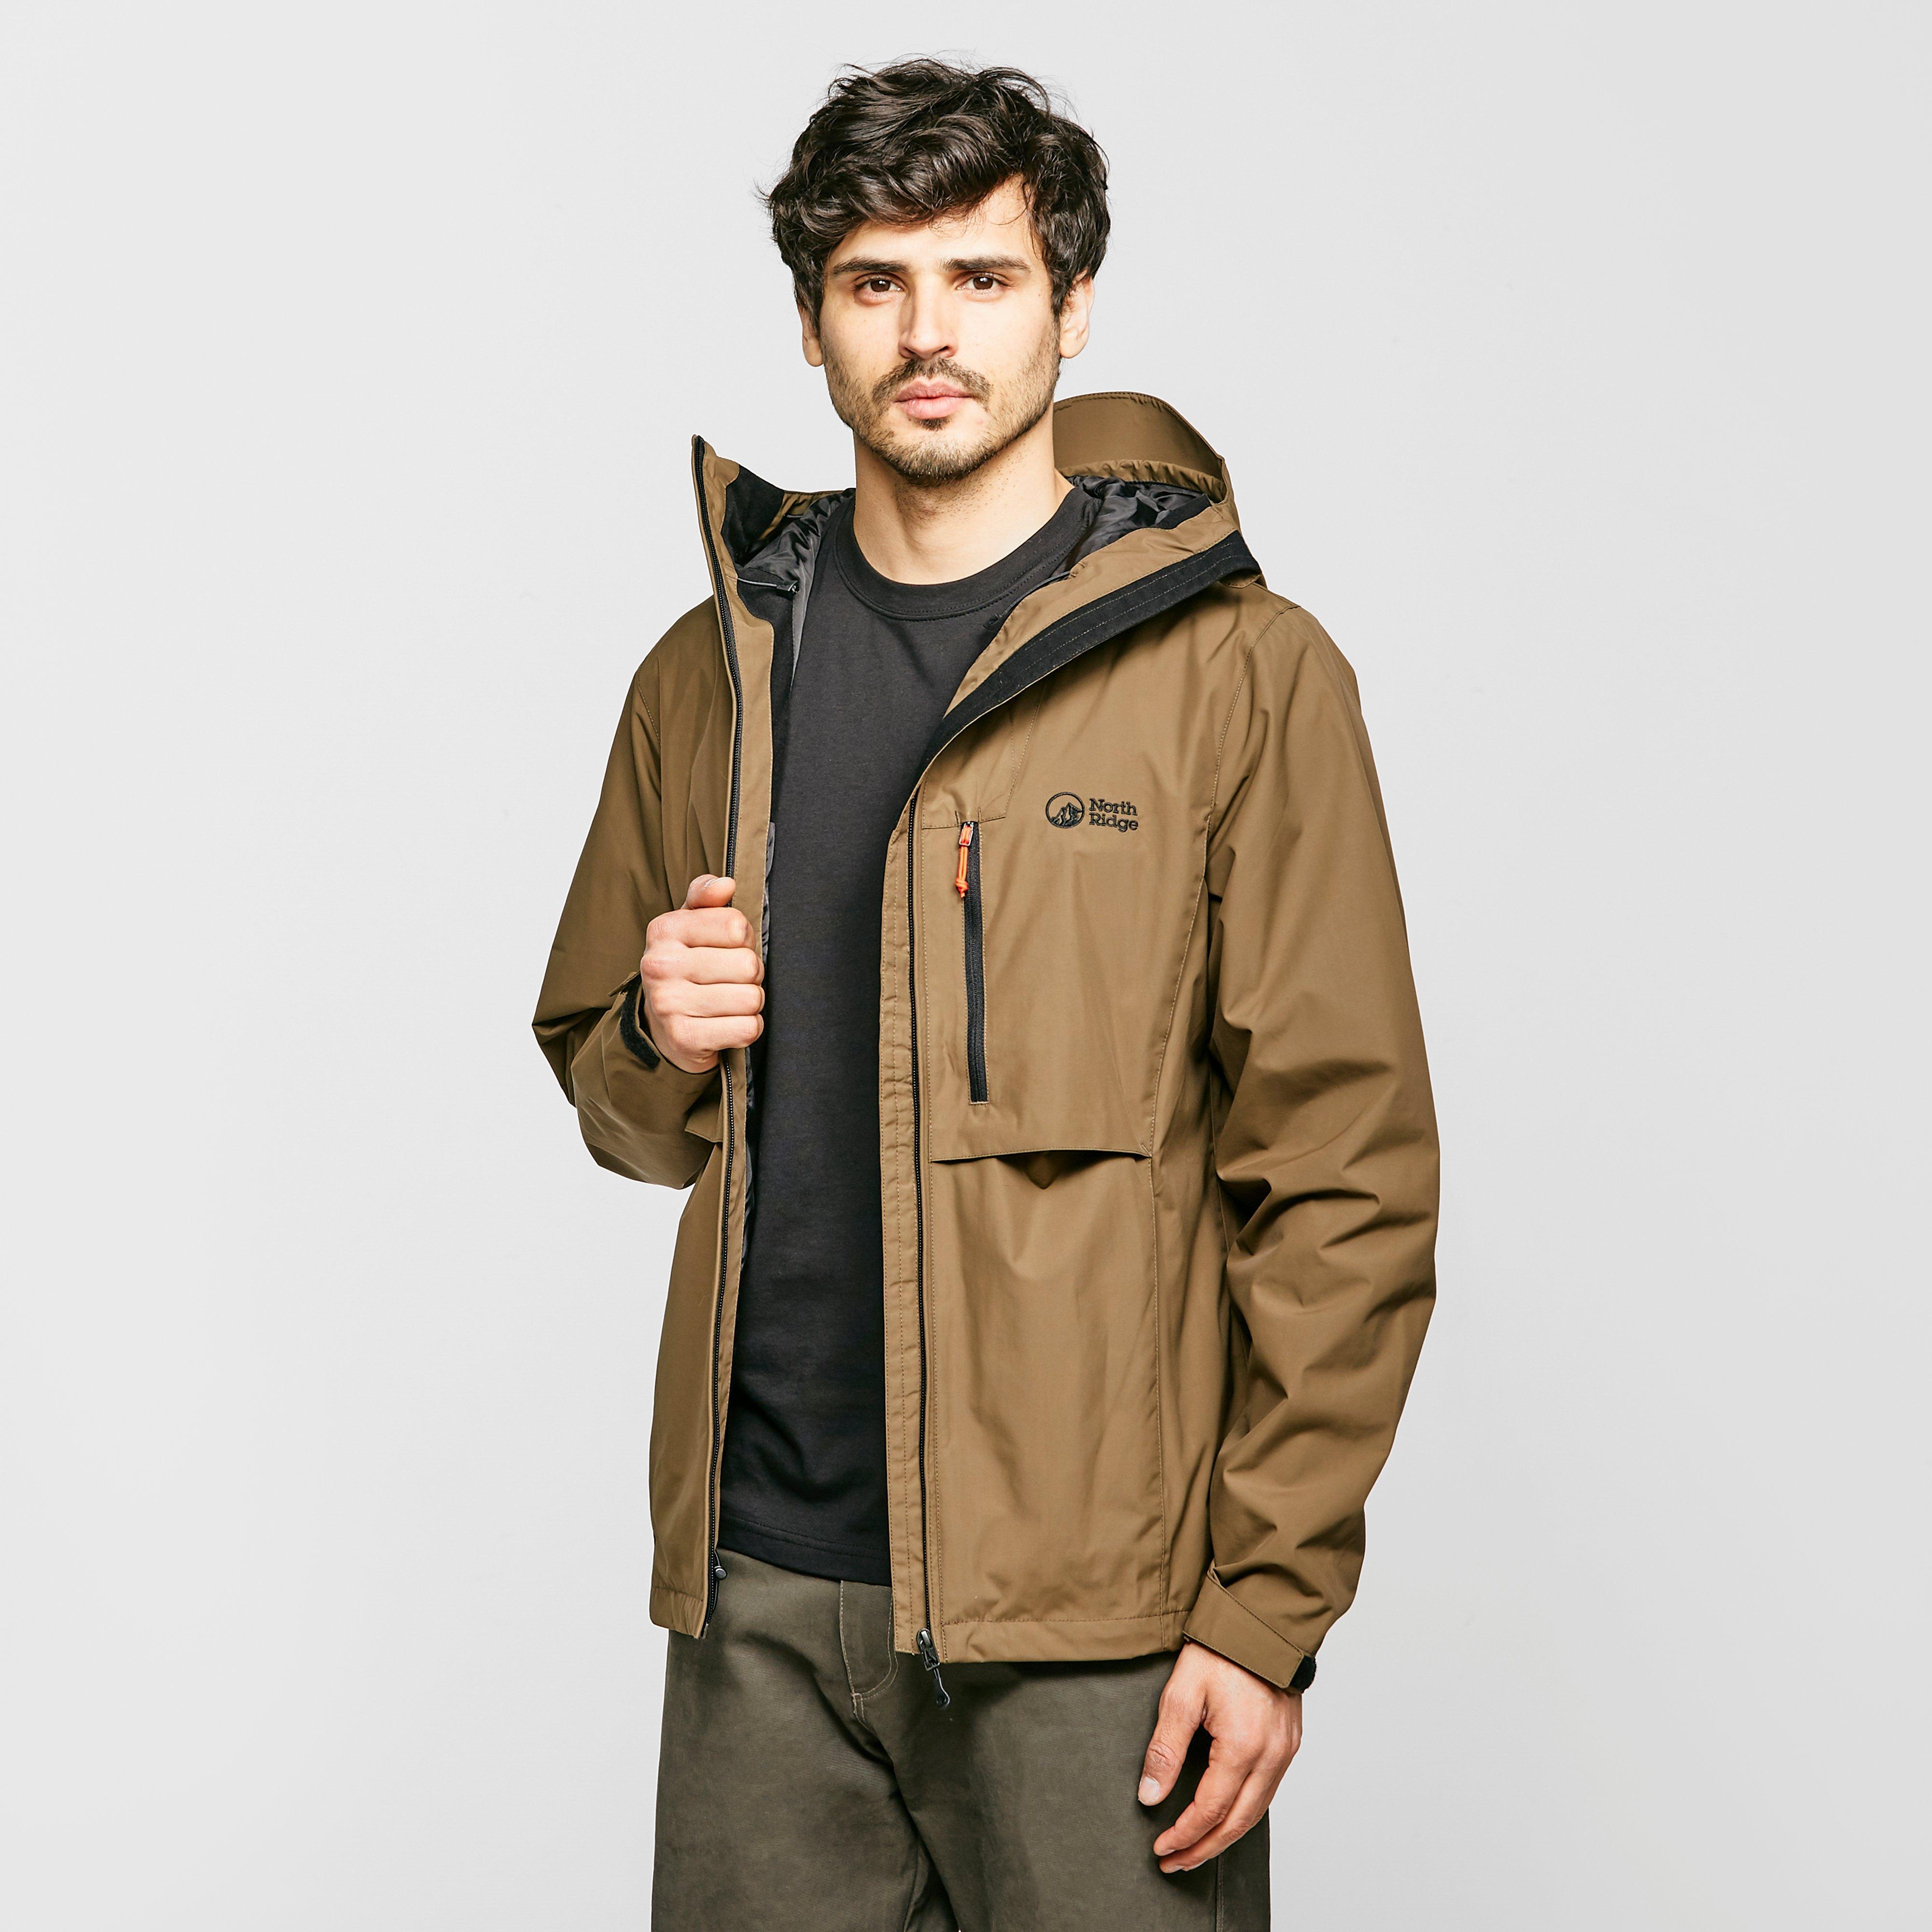 North Ridge Men's Shoalwater Waterproof Jacket - Brown/Khaki, Brown